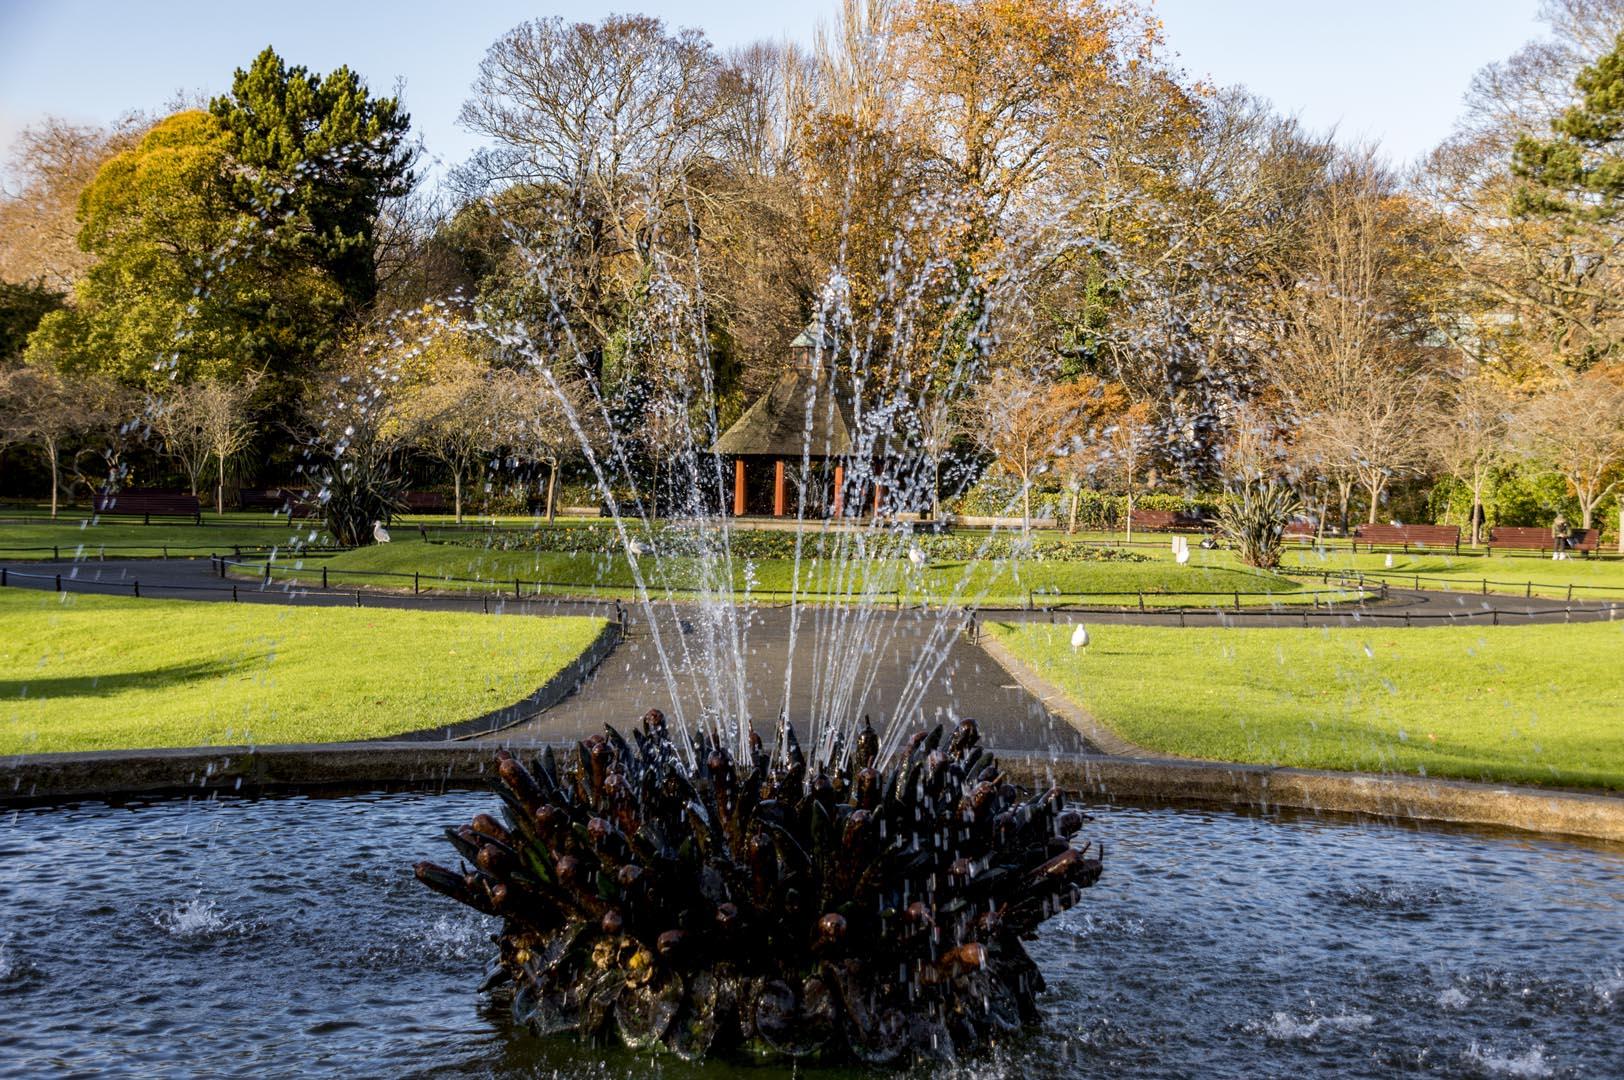 Dublin attraction - St Stephen's Green